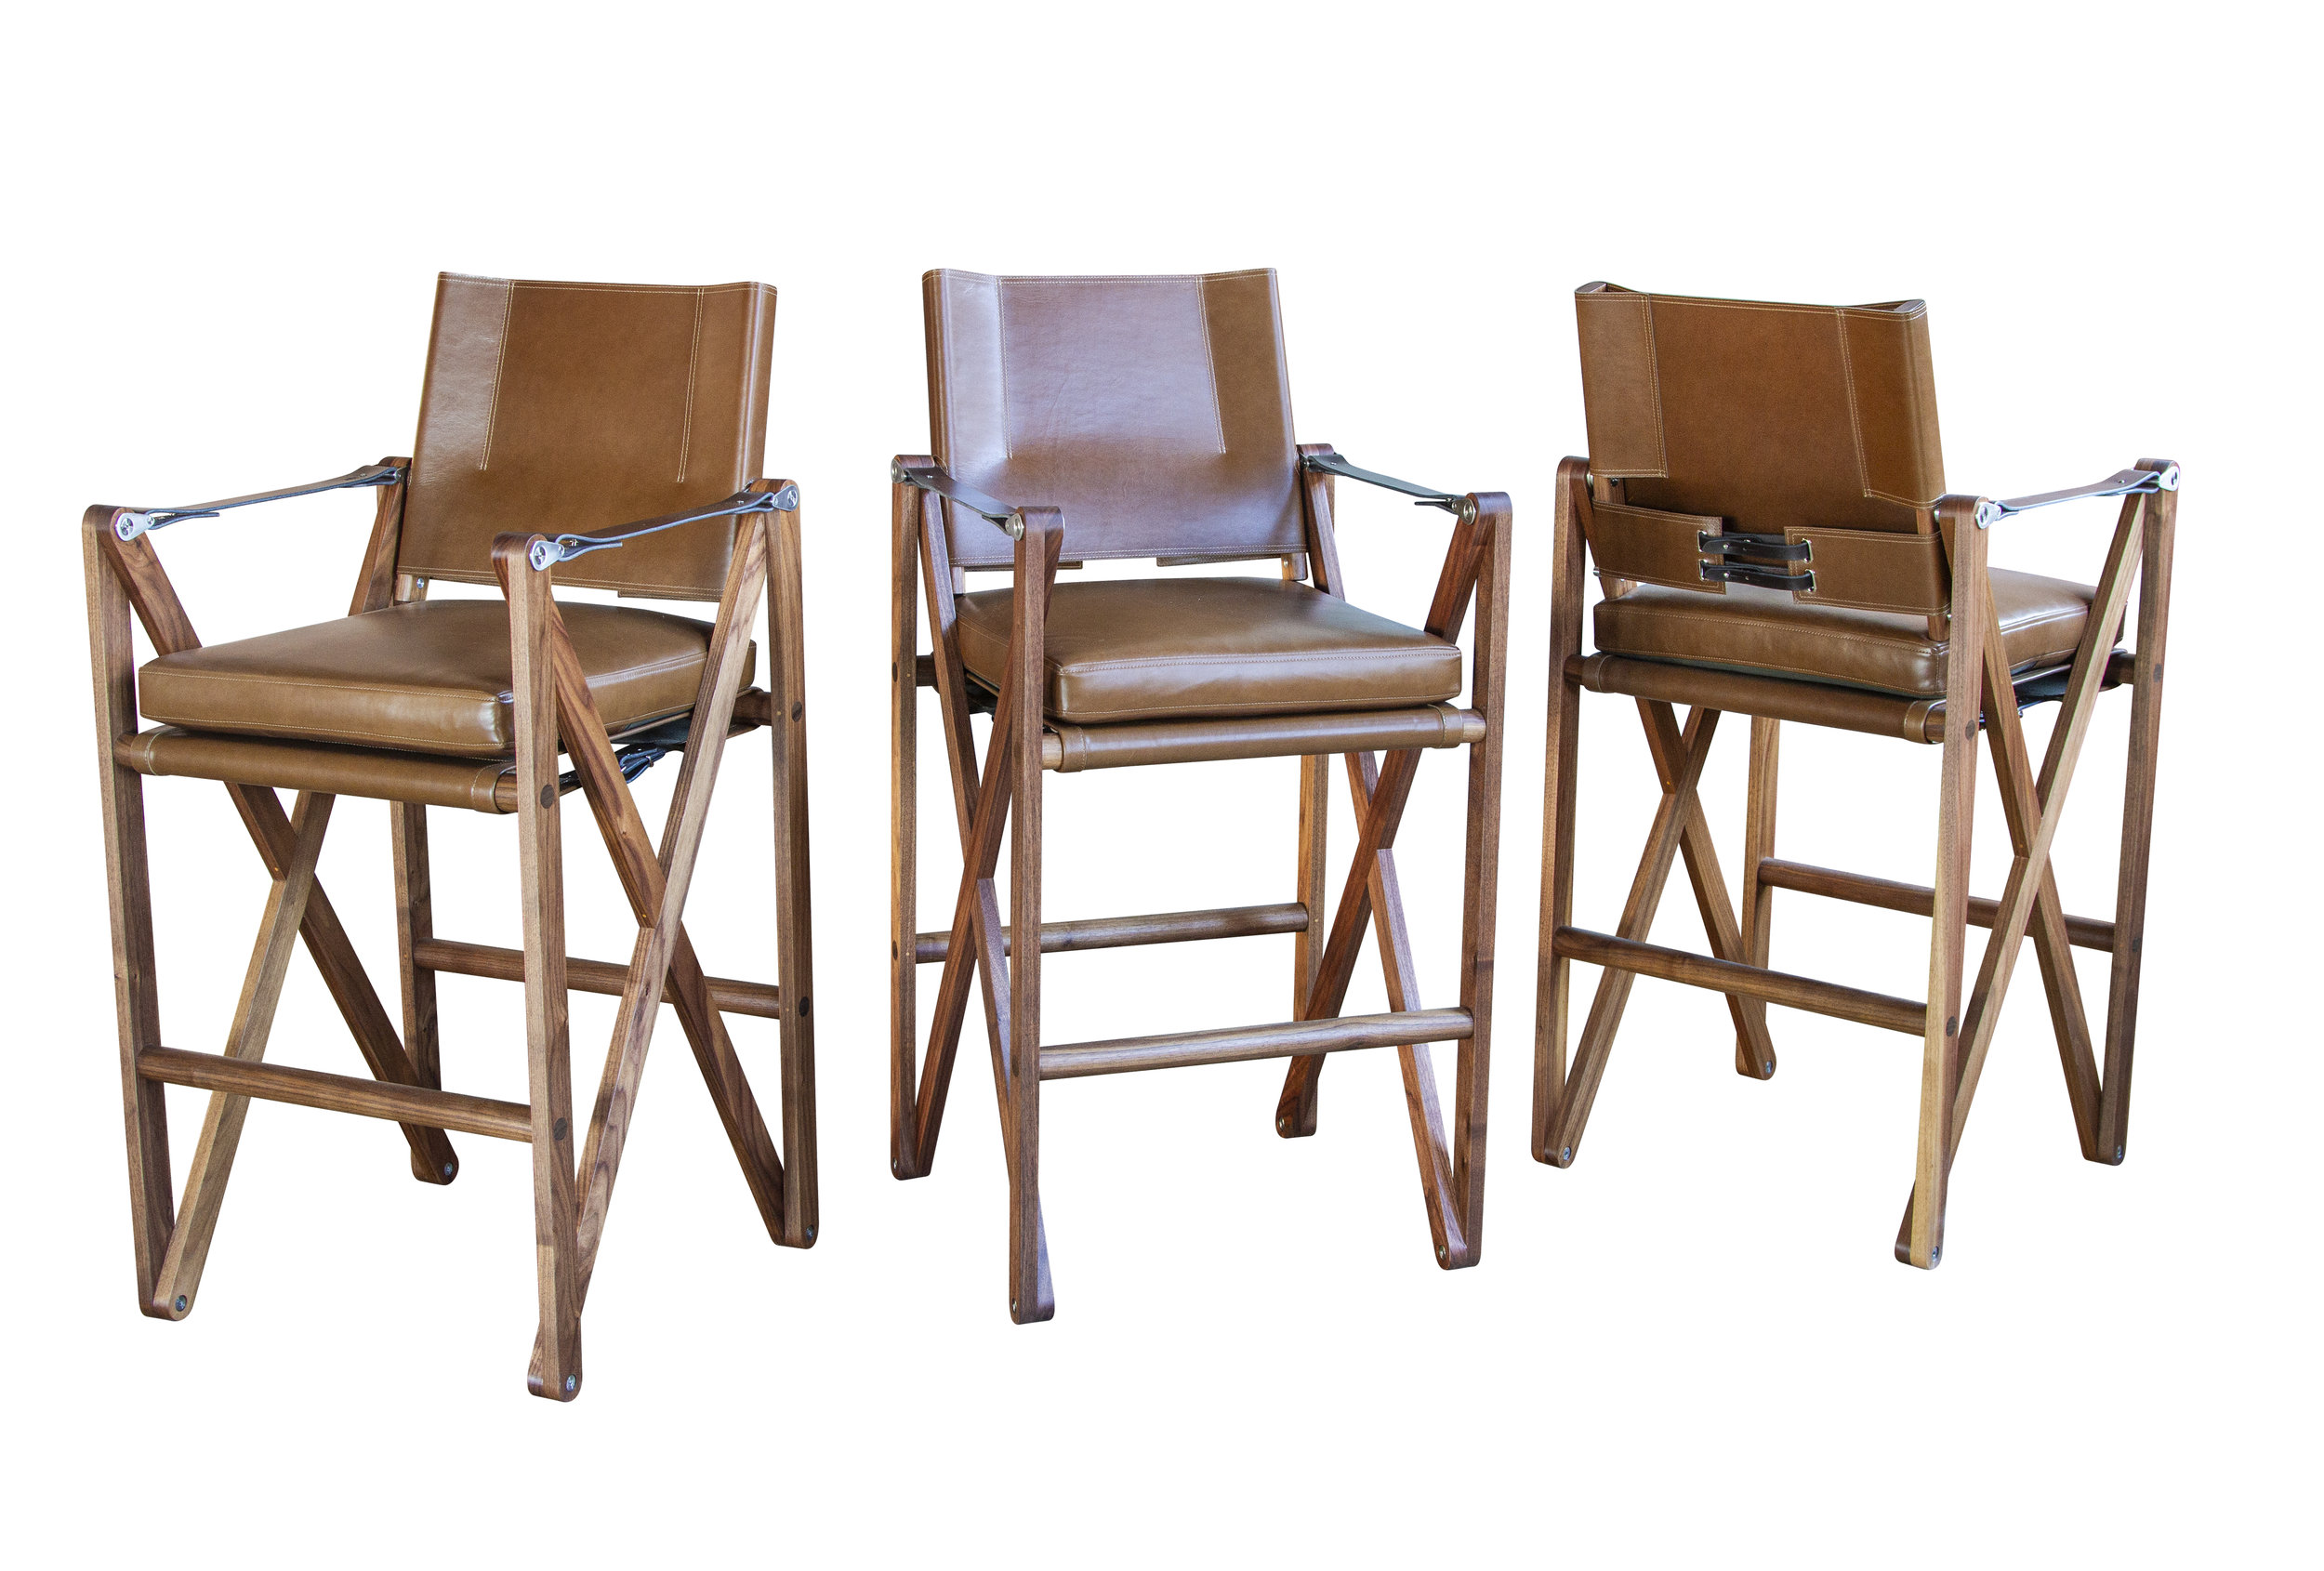 MacLaren Bar Chairs - Wide